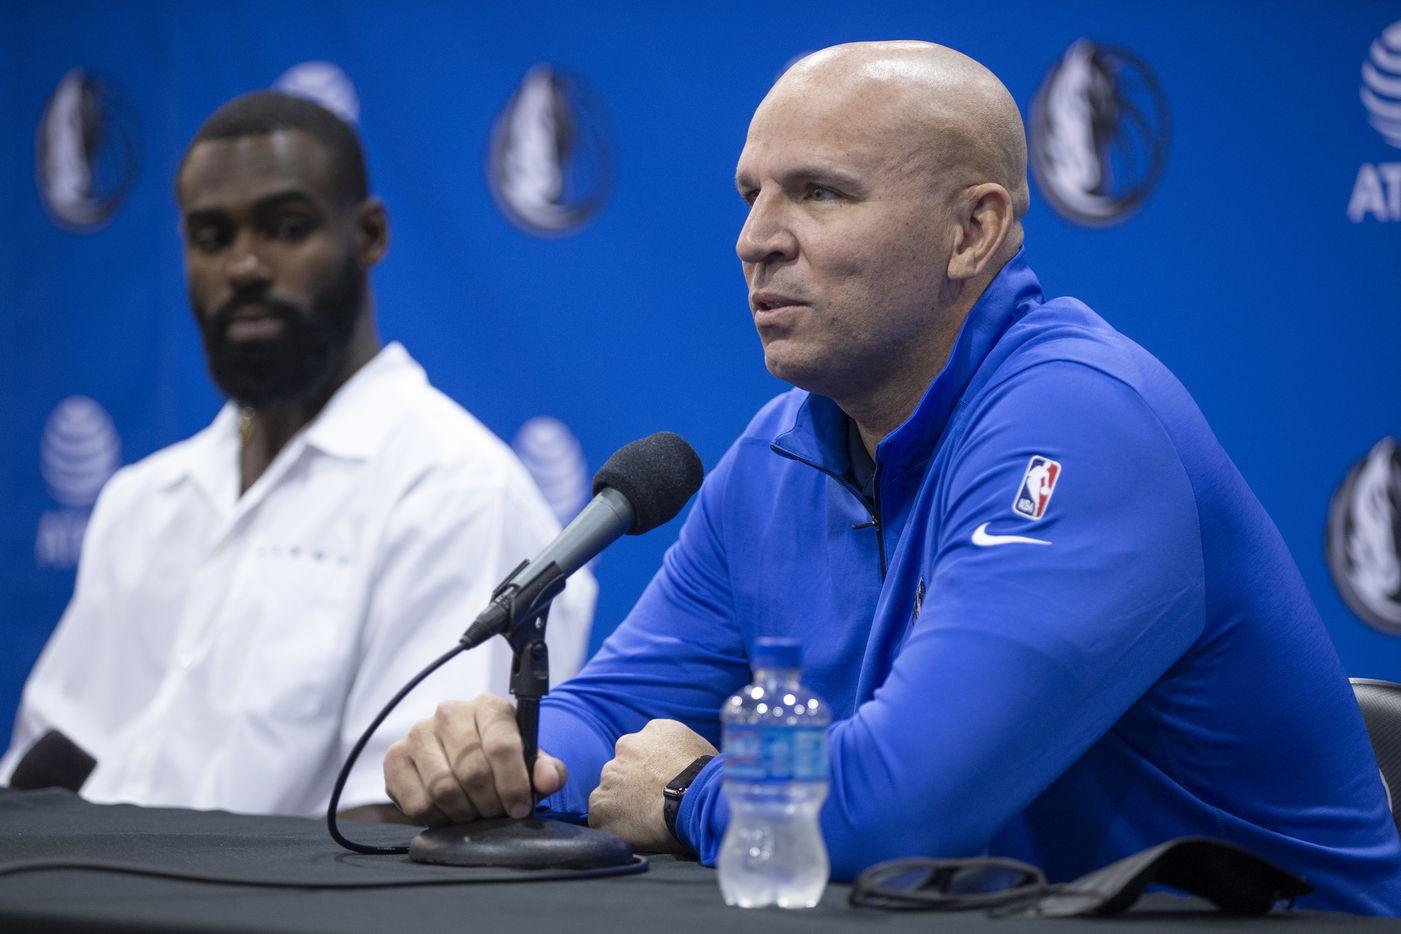 Dallas Mavericks head coach Jason Kidd speaks during a press conference in Dallas, Friday, August 27, 2021. (Brandon Wade/Special Contributor)